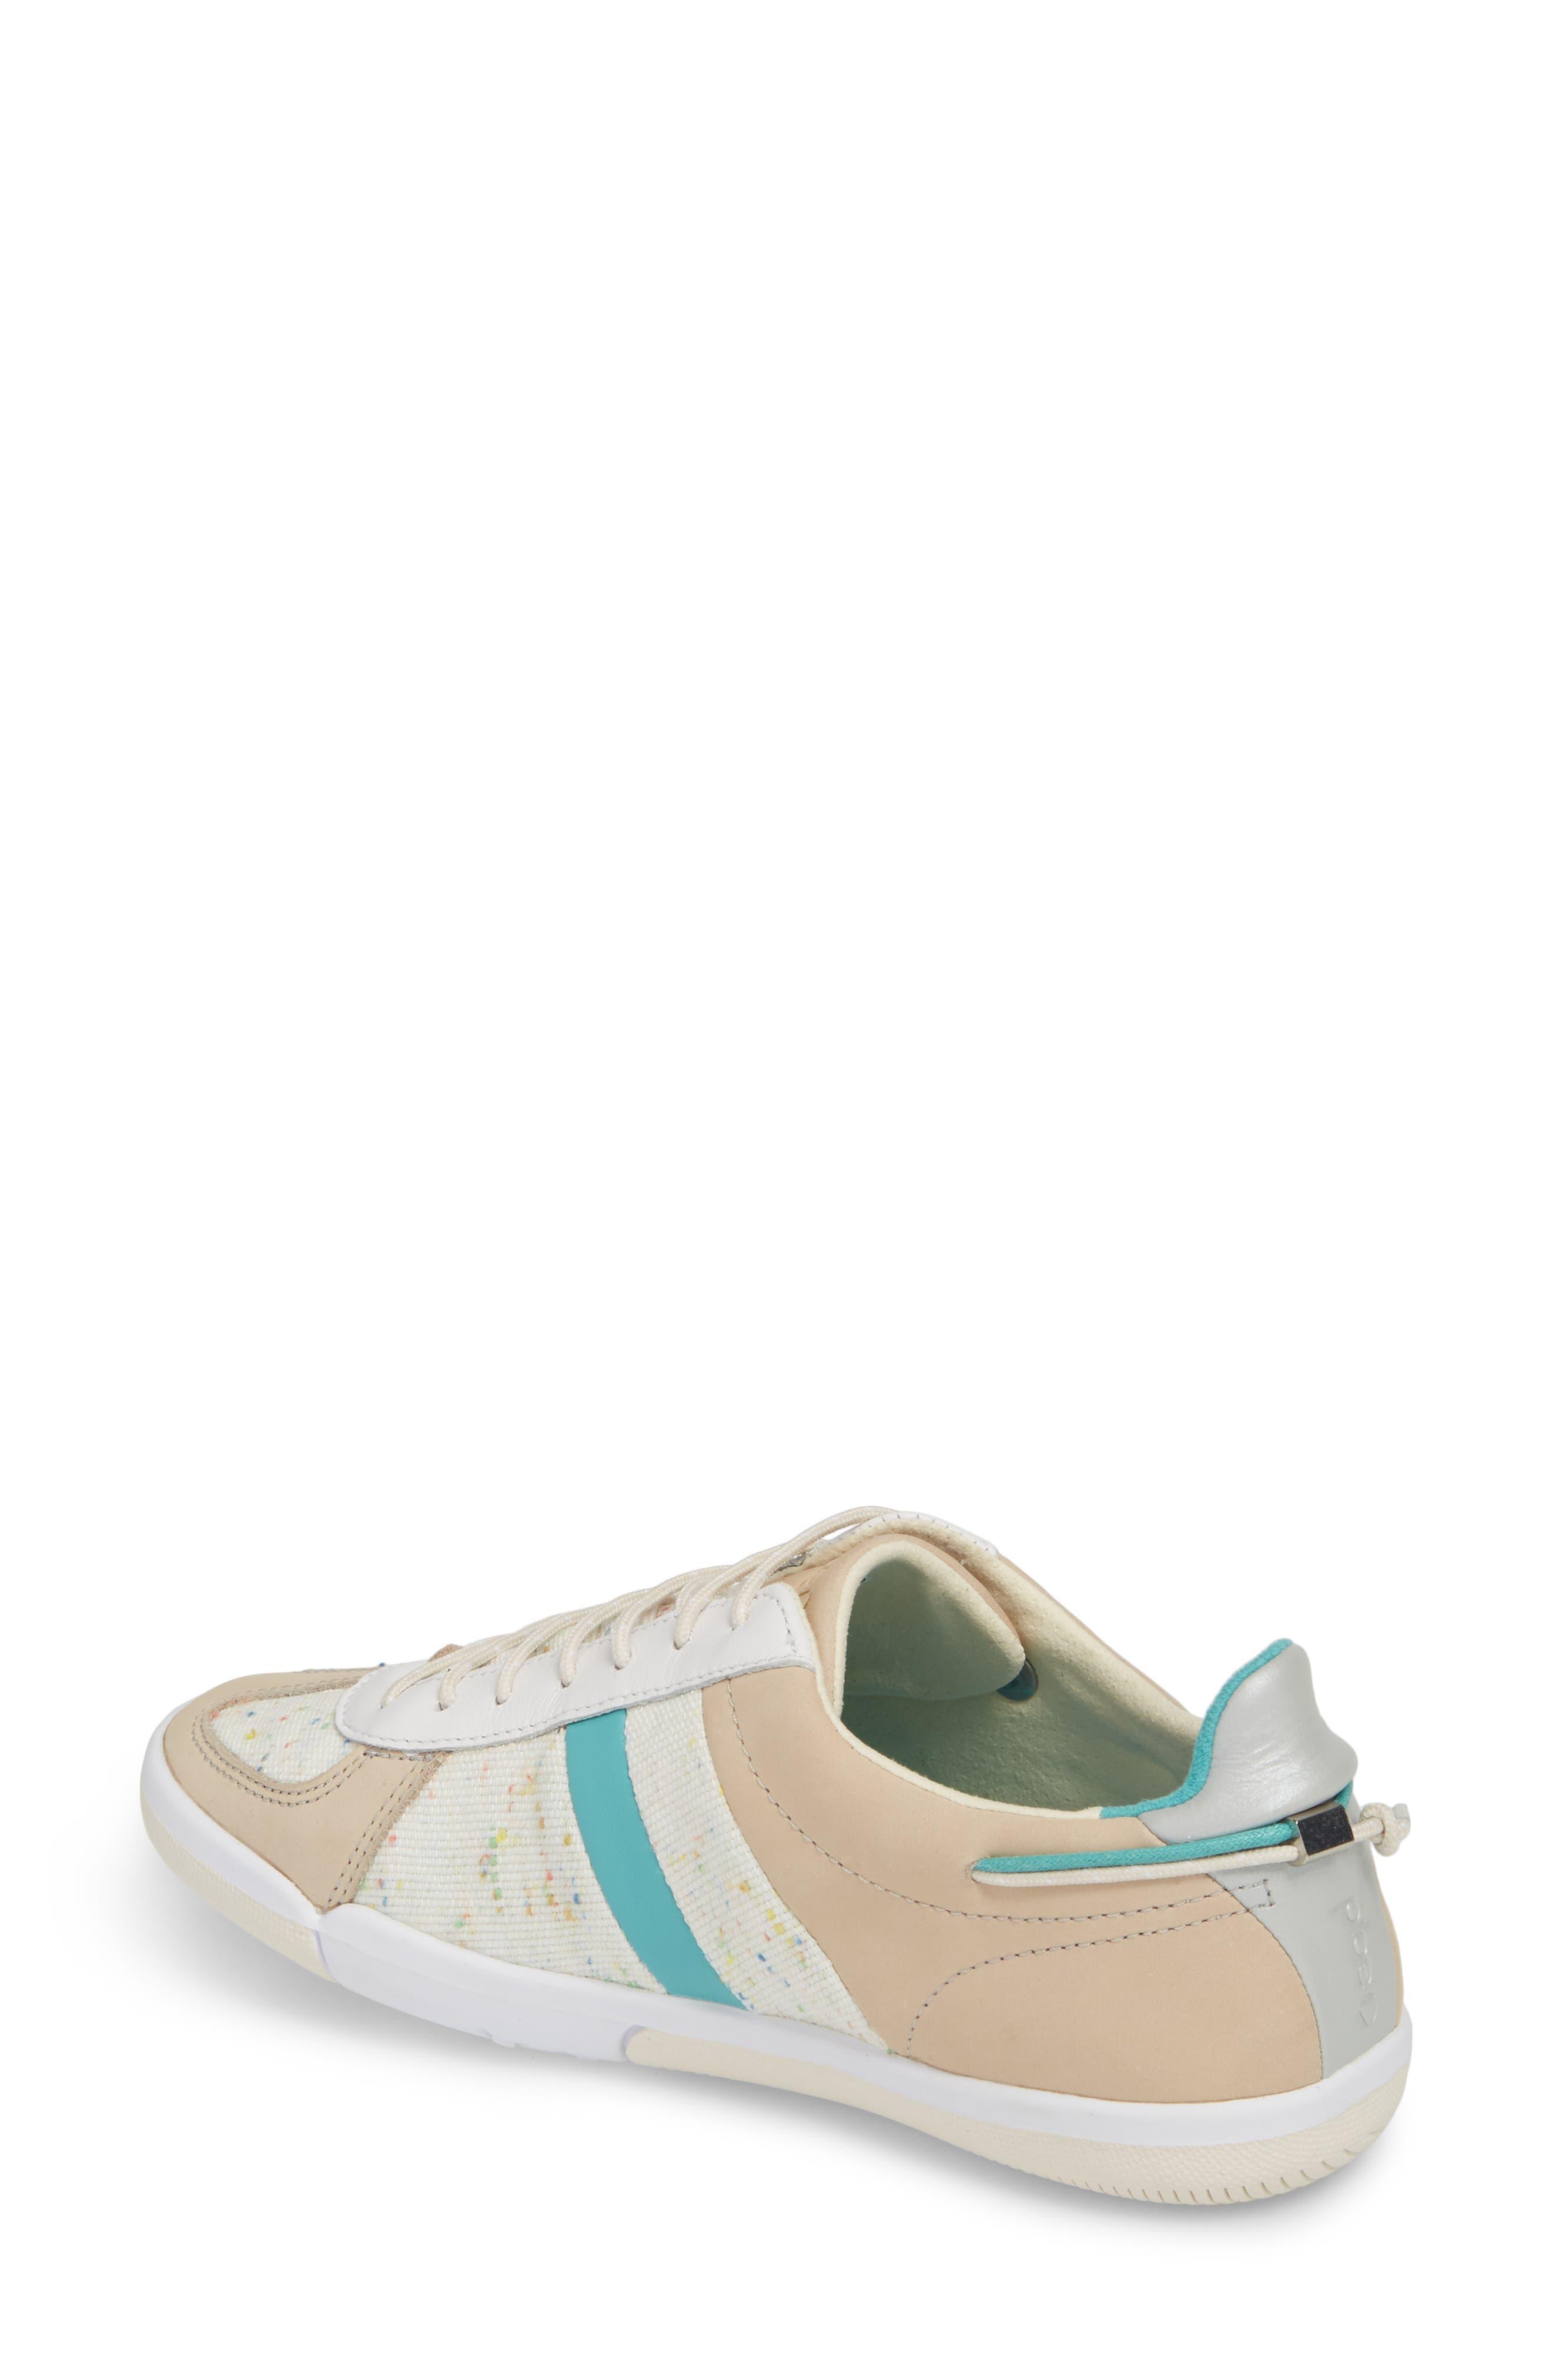 Butler Sneaker,                             Alternate thumbnail 2, color,                             Turtledove Leather